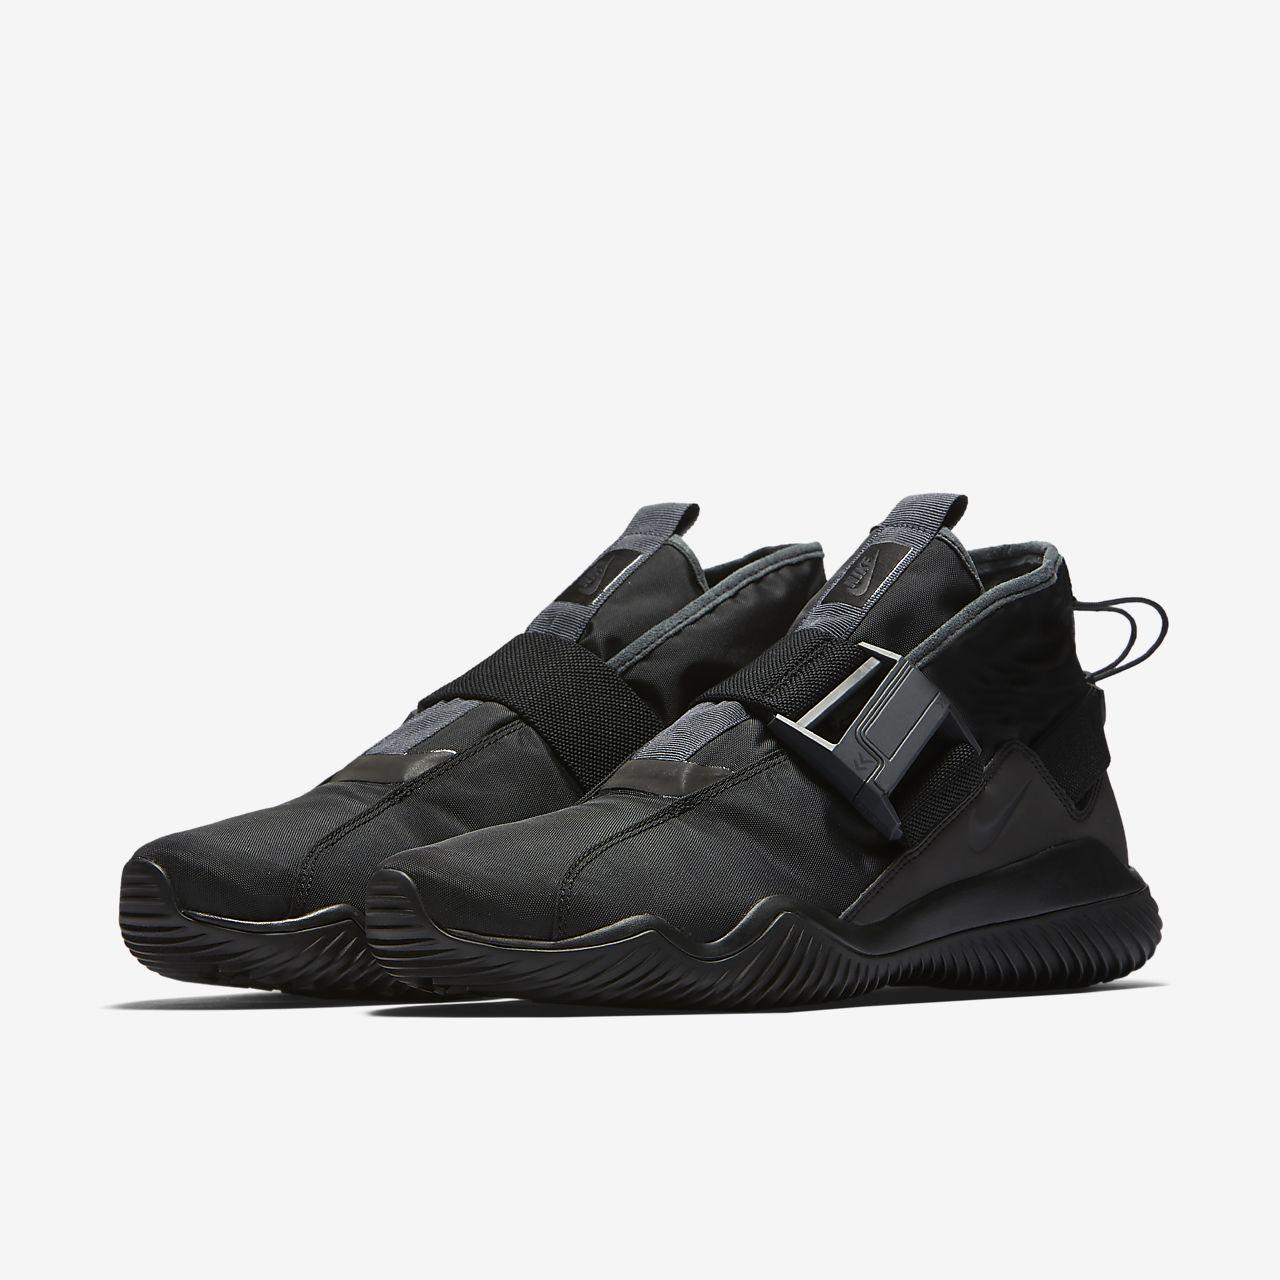 premium selection a2bac cd143 ... Nike Komyuter SE Men s Shoe